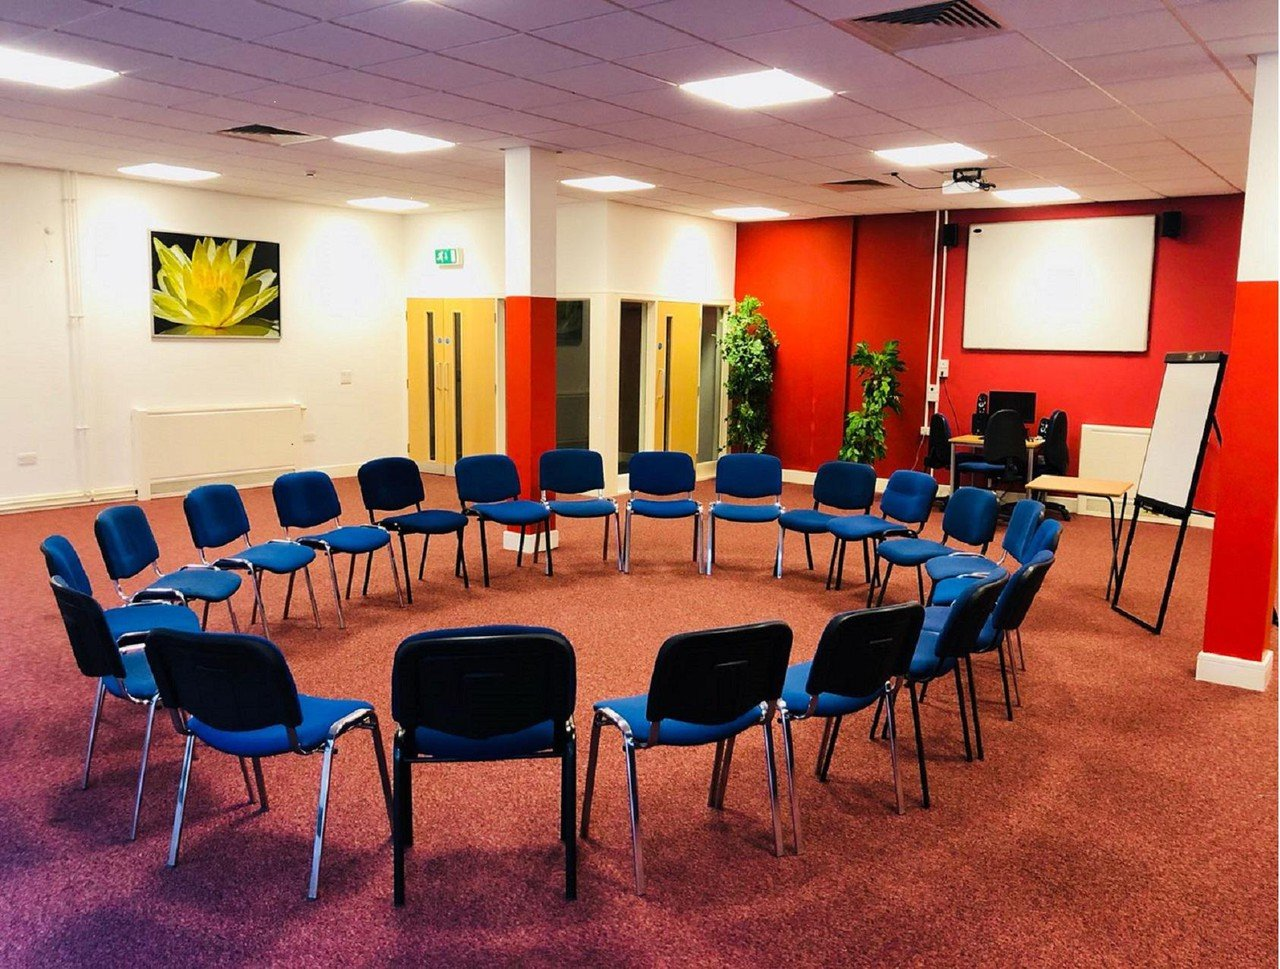 Birmingham  Meetingraum Lets Talk Business image 2